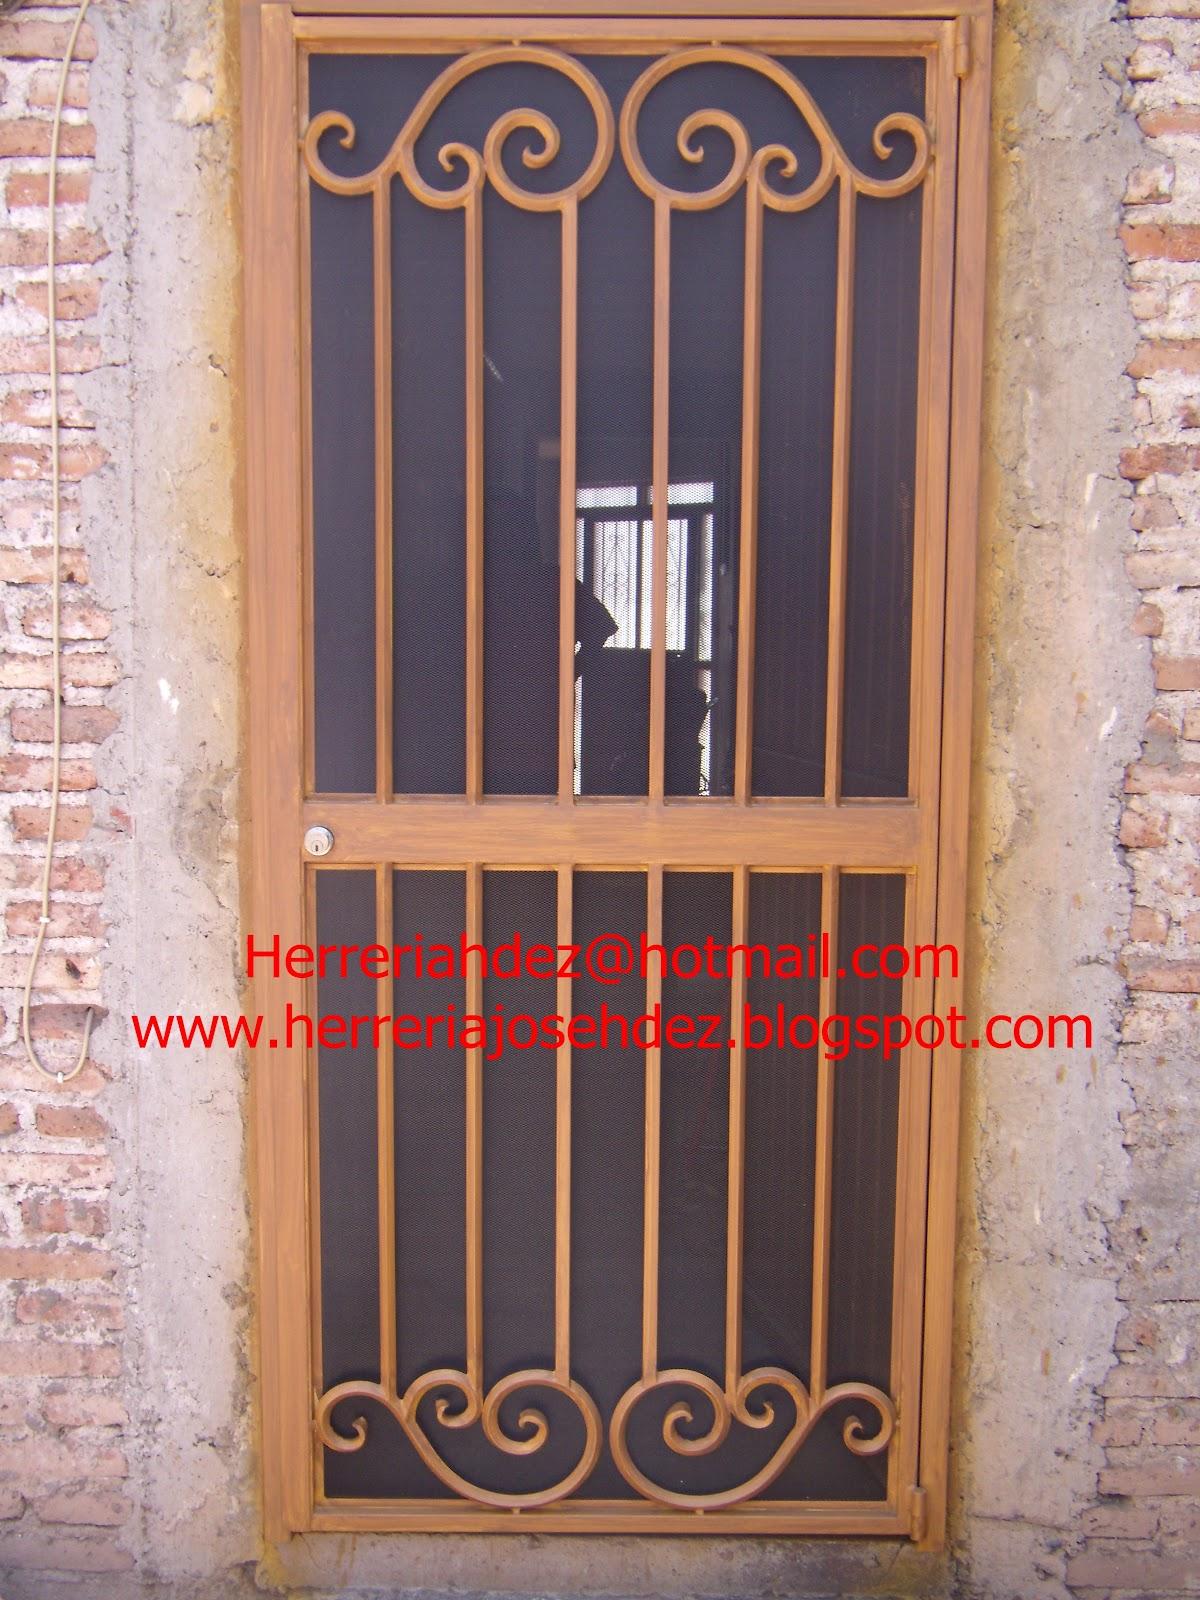 Herreria art stica hern ndez dale click en entradas - Puertas mosquiteras de madera ...